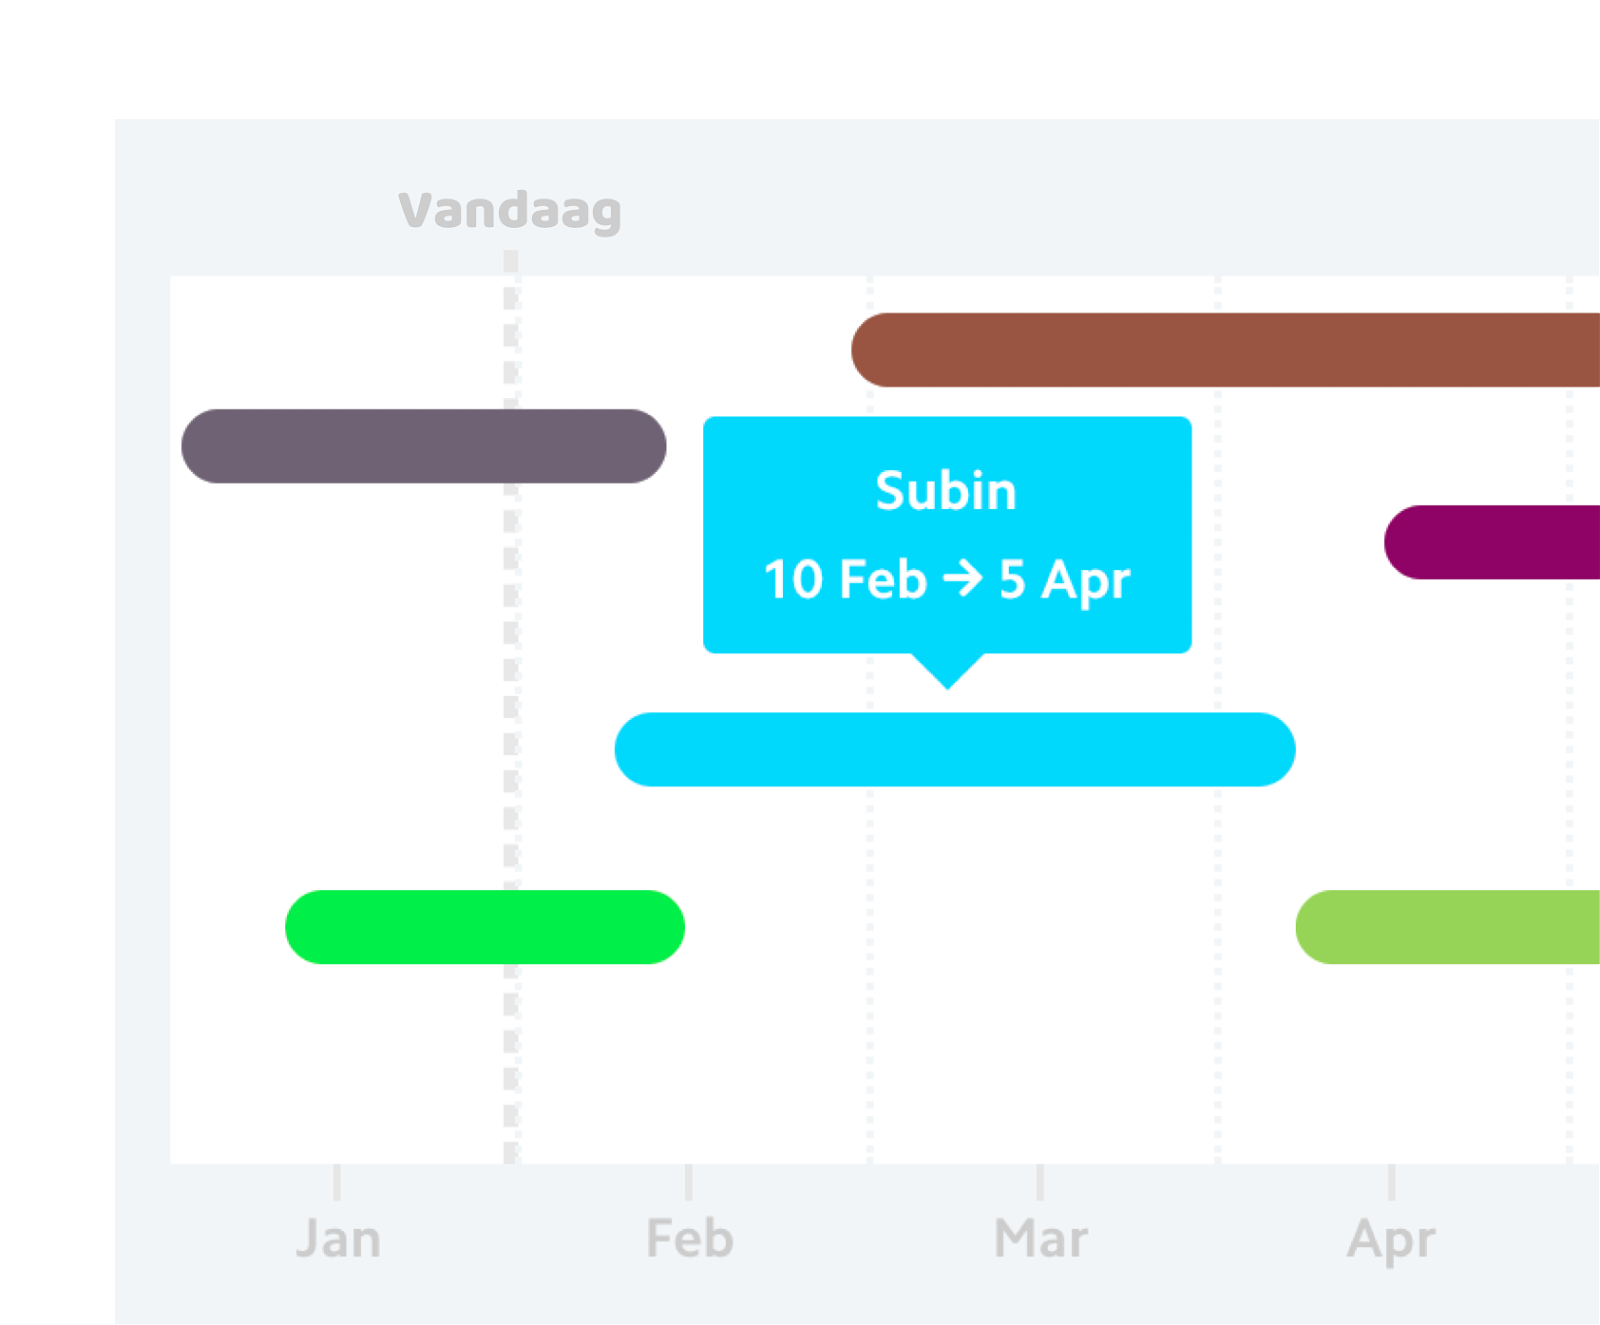 "Project management <mark data-aos=""highlight-text"" data-aos-delay=""250"" class=""aos-init aos-animate"">eenvoudig gemaakt</mark>"